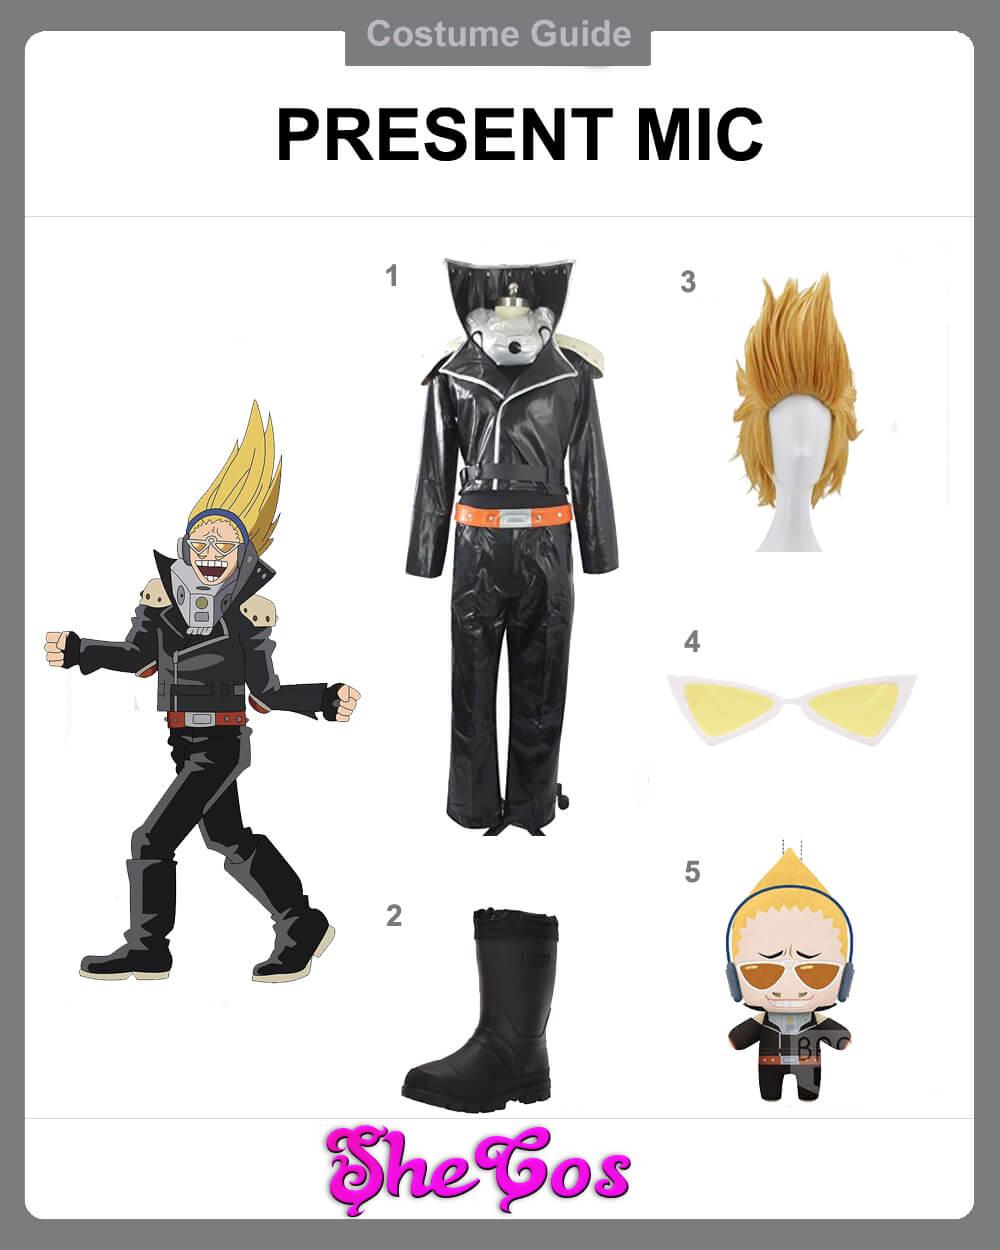 present mic cosplay diy